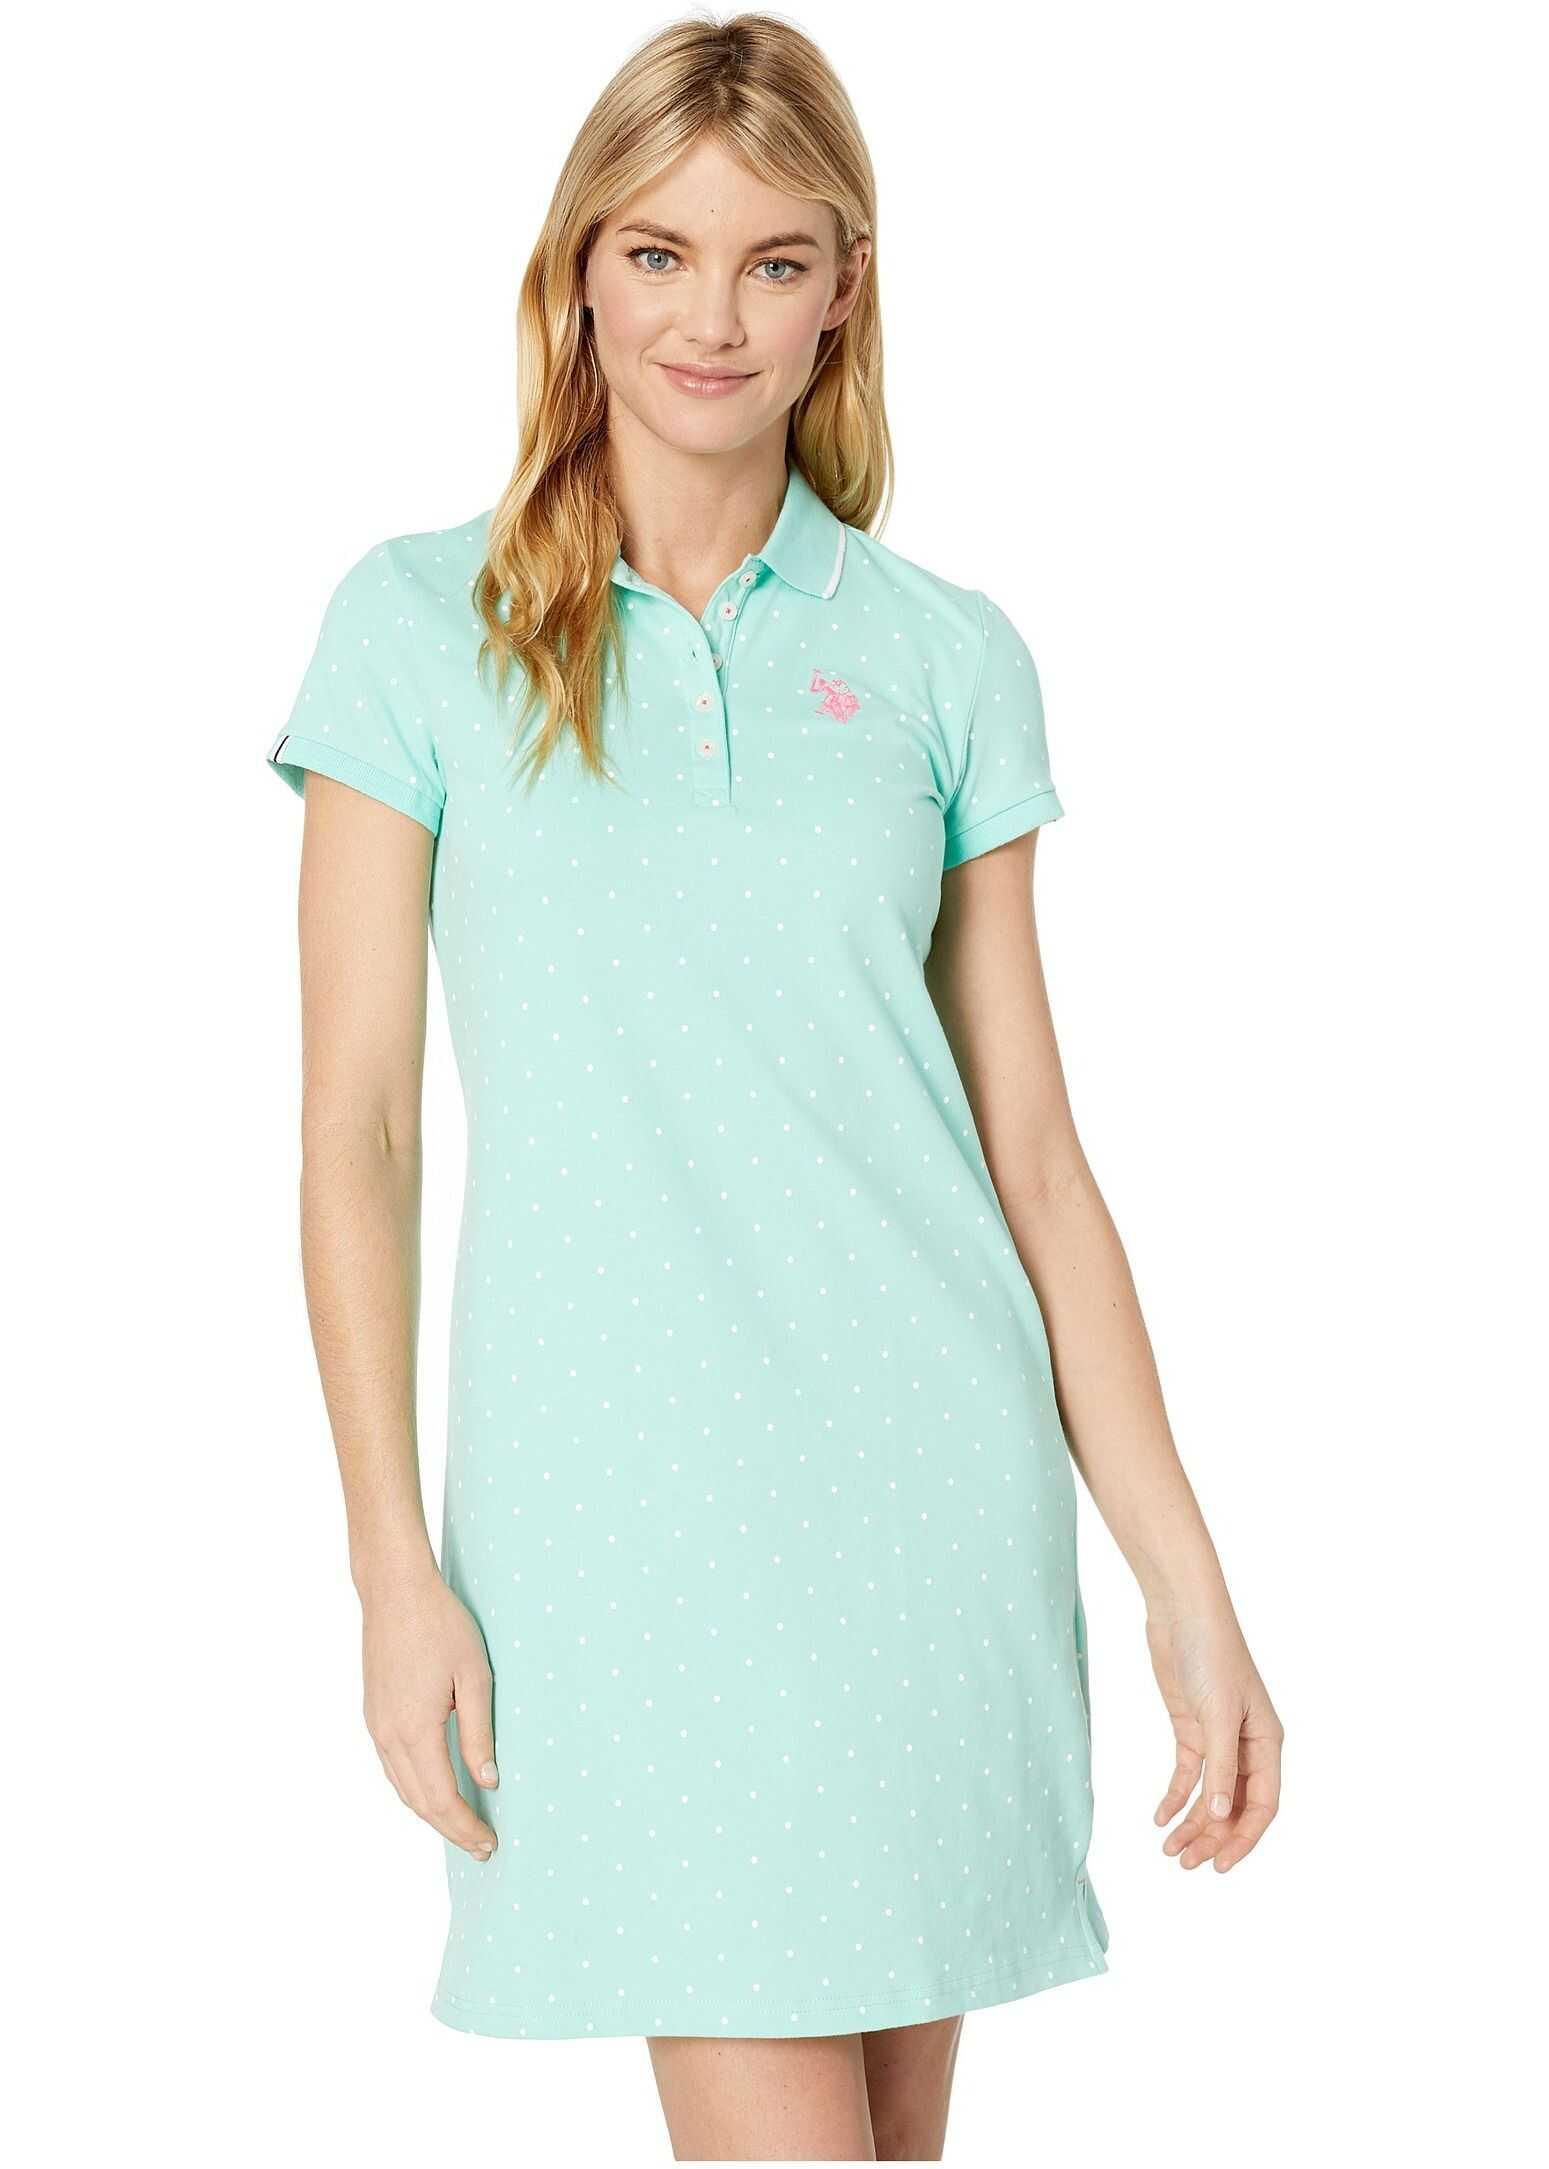 U.S. POLO ASSN. Dot Polo Dress Trellis Aqua